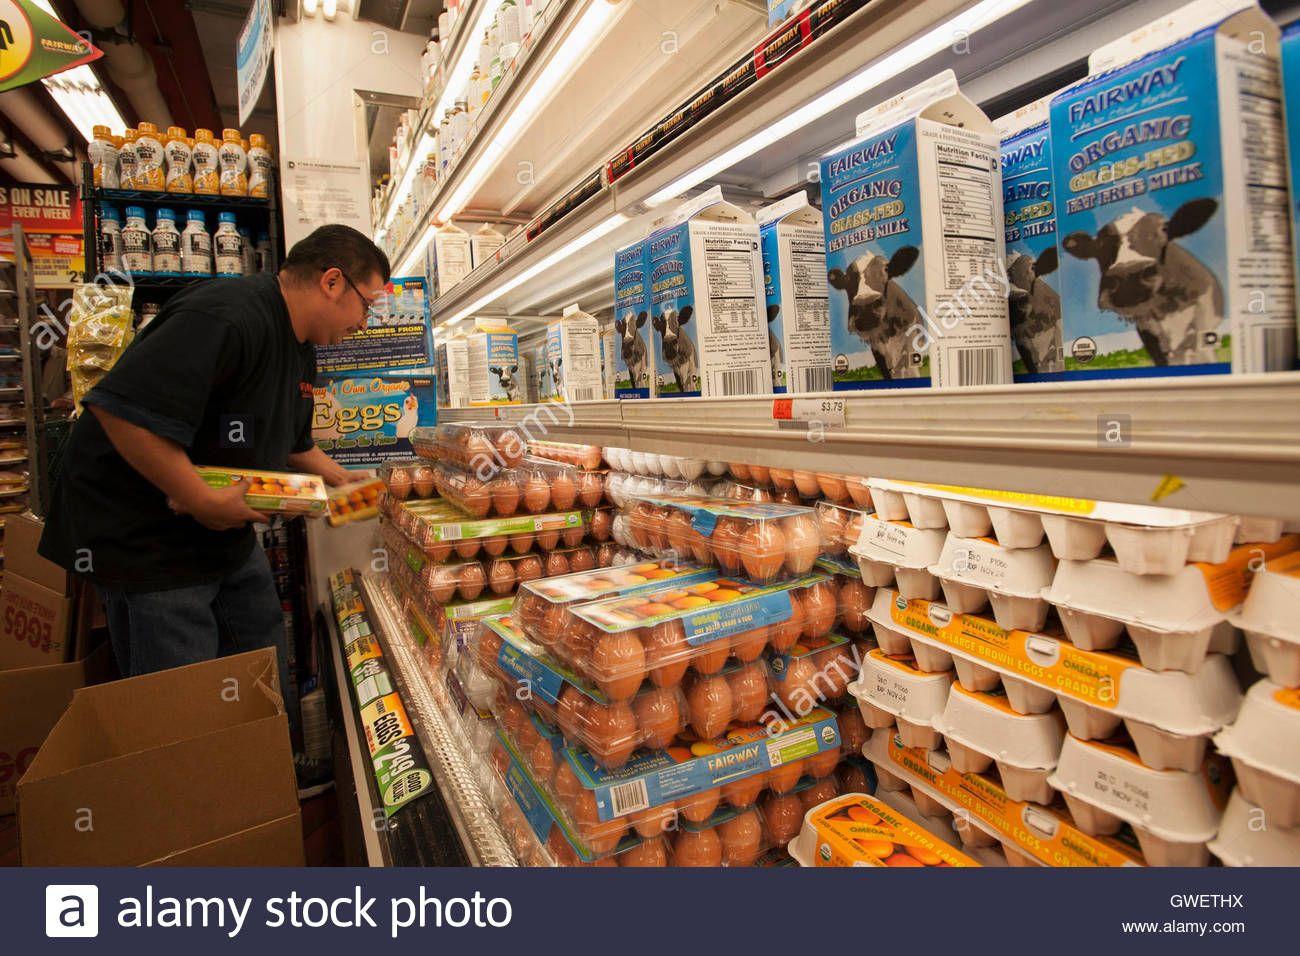 Job duties putting things on the egg shelves to make